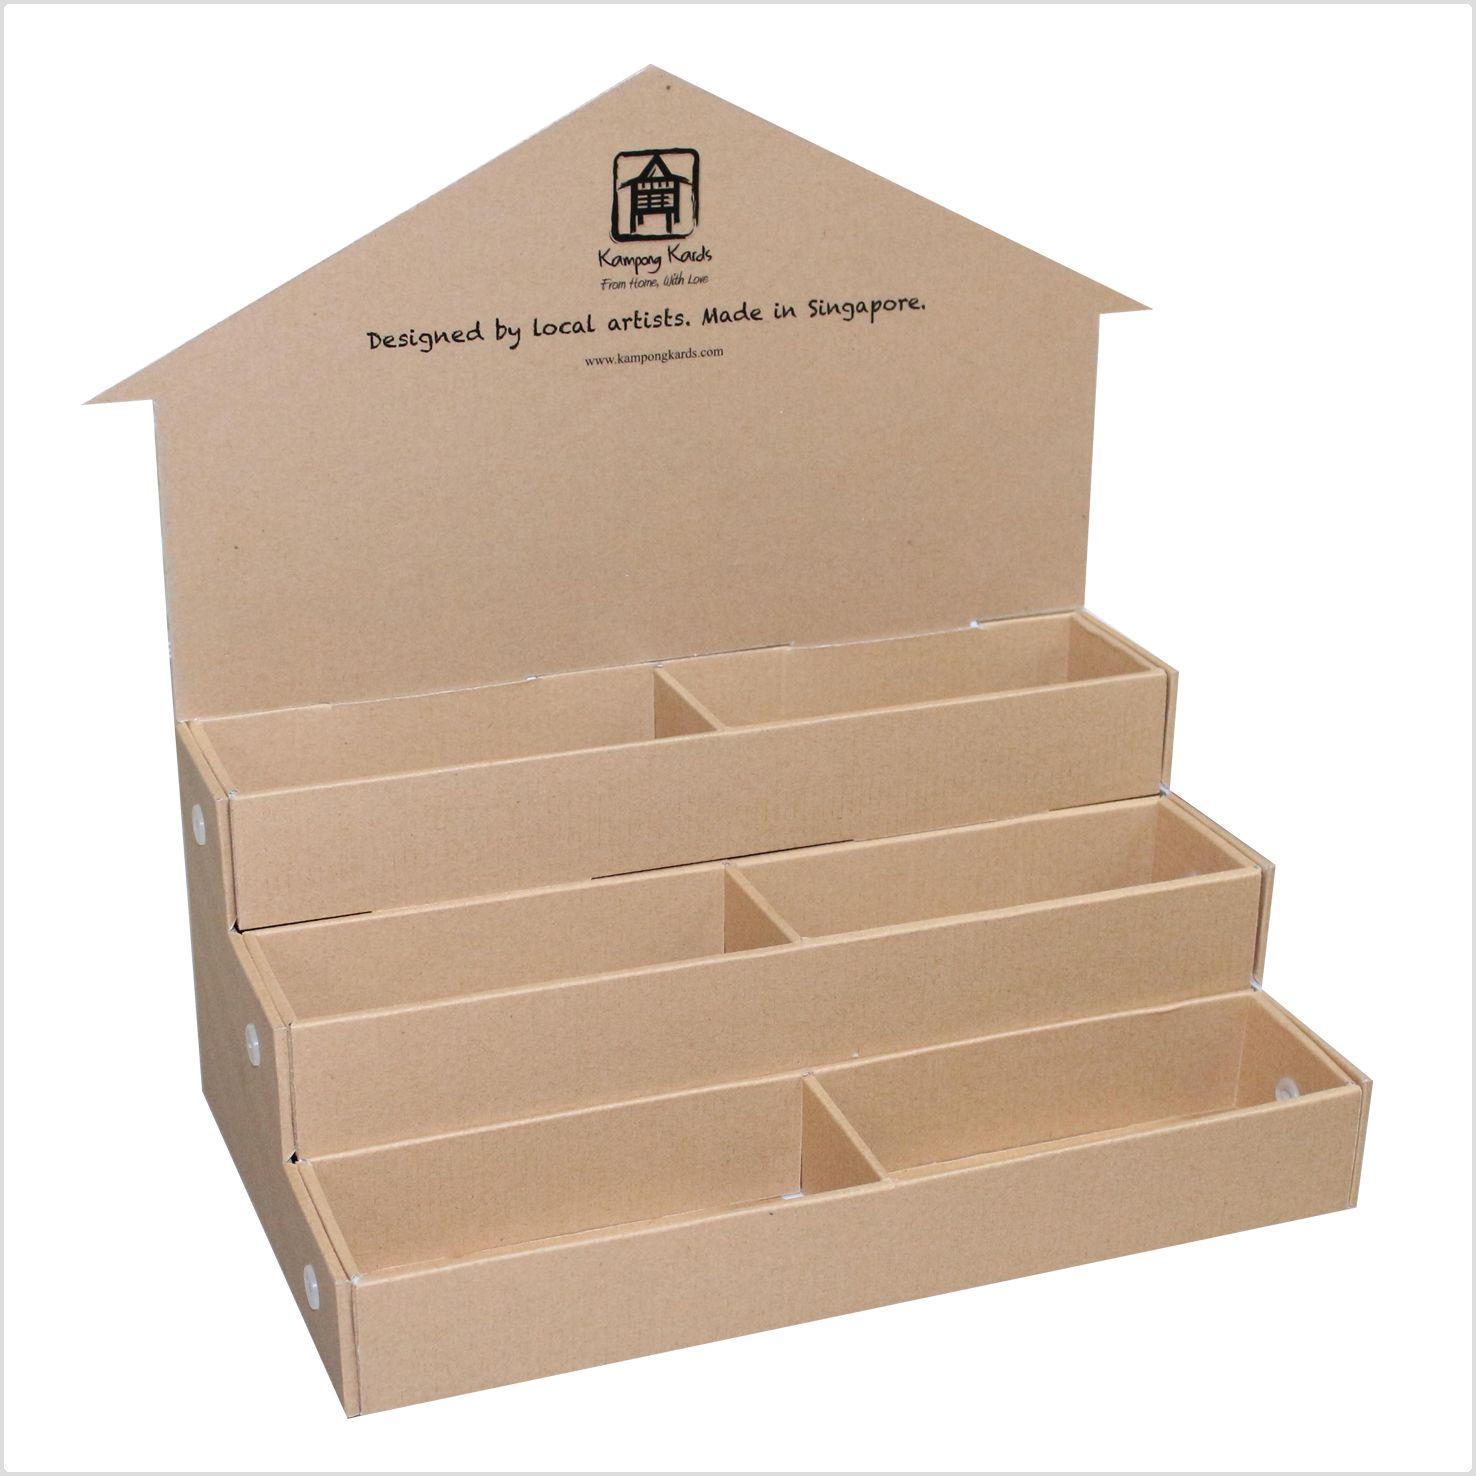 cardboard point of sale google search ลังกระดาษ